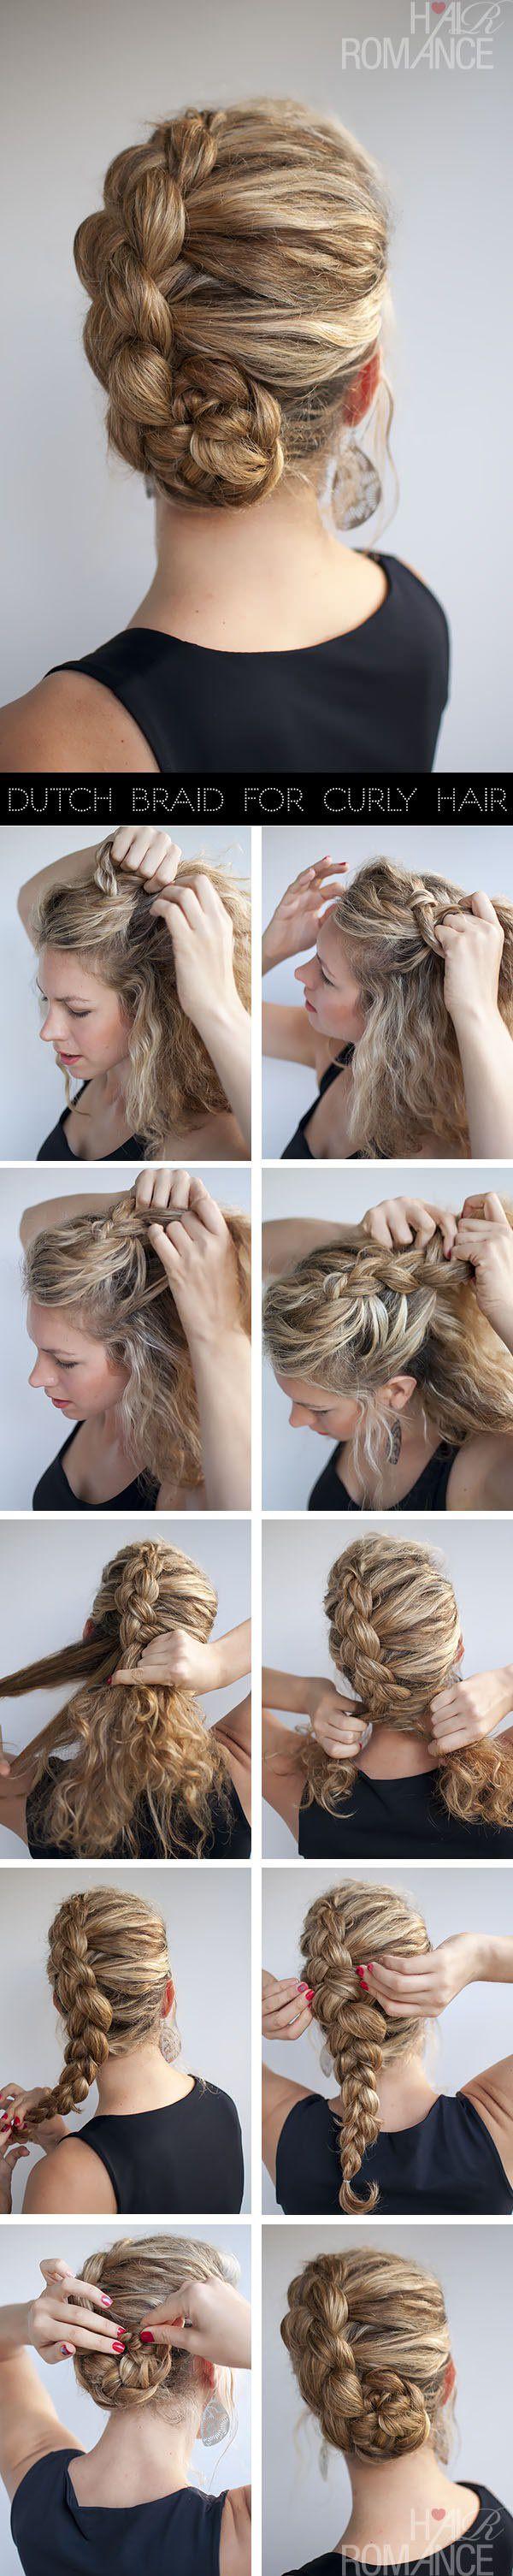 27easy-updos-for-long-hair-100416